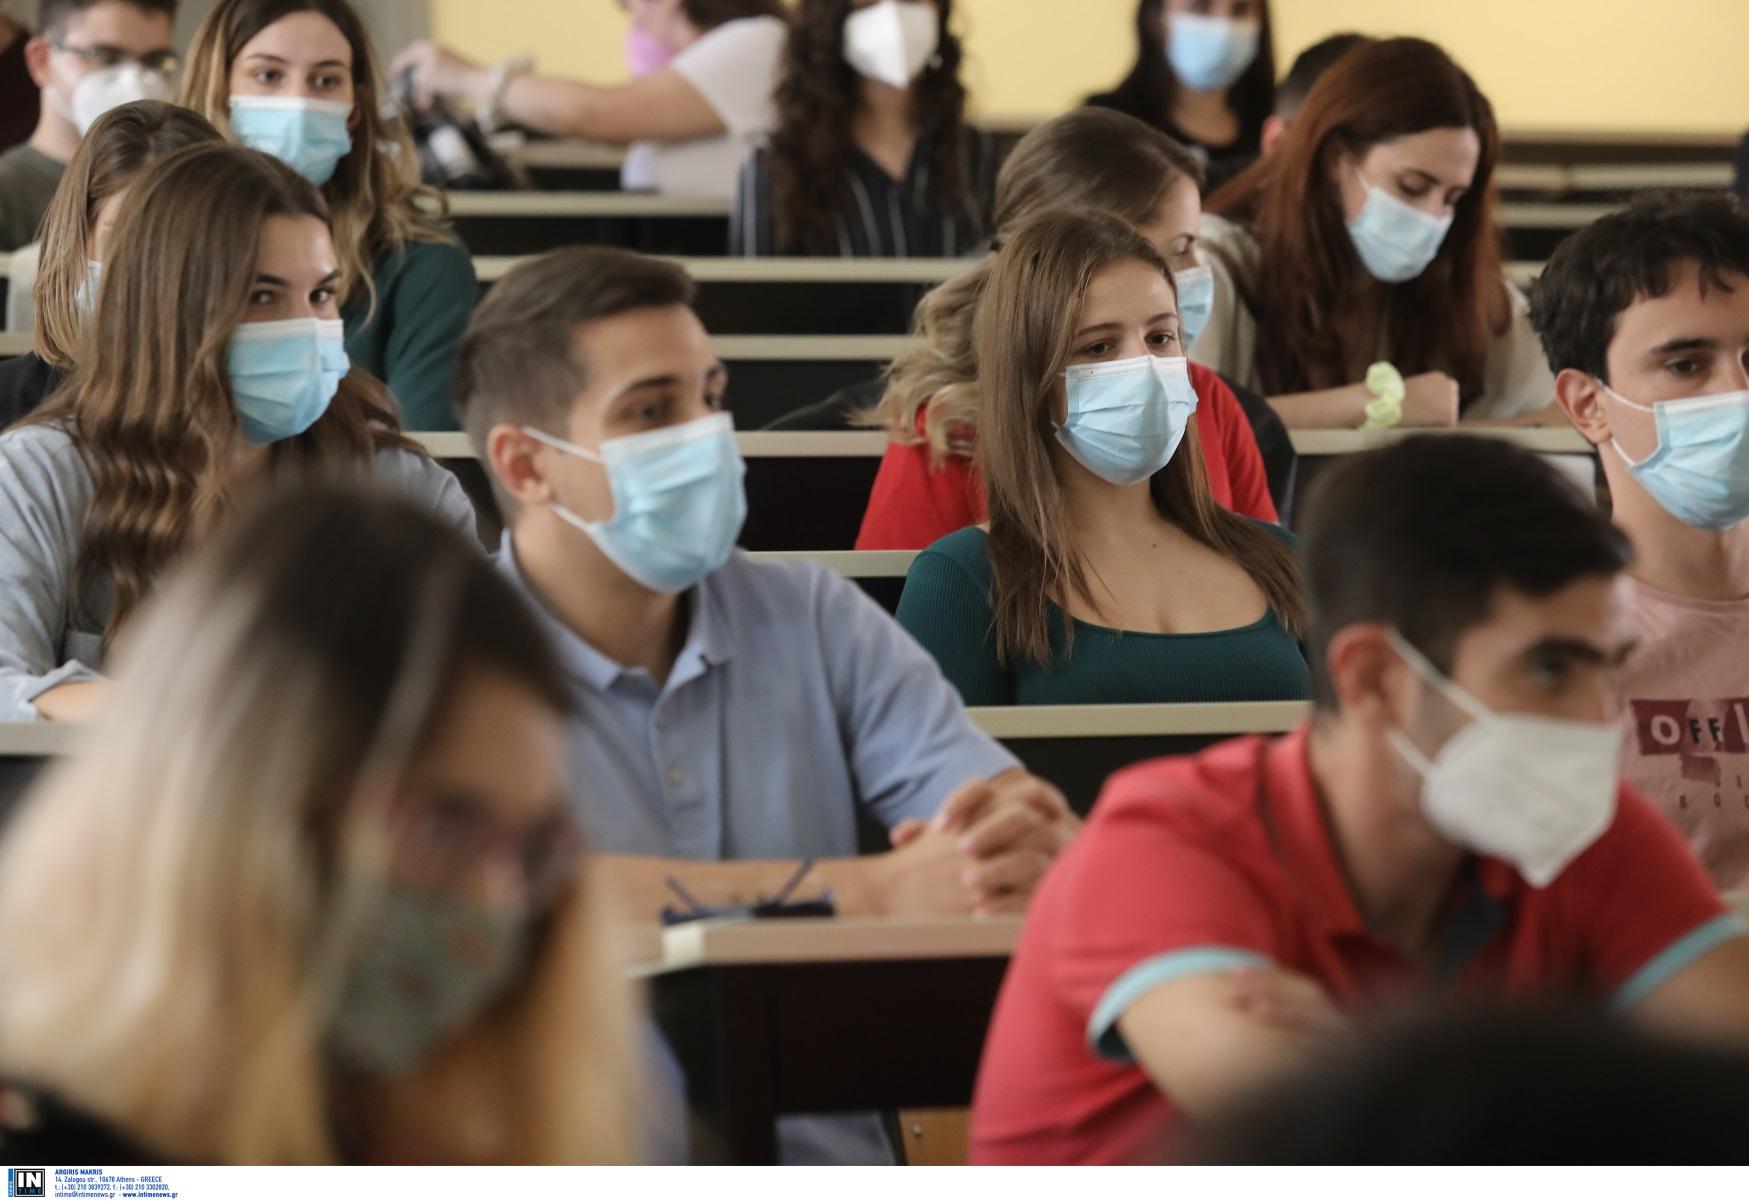 edupass.gov.gr: Σε λειτουργία η πλατφόρμα για τα Πανεπιστήμια